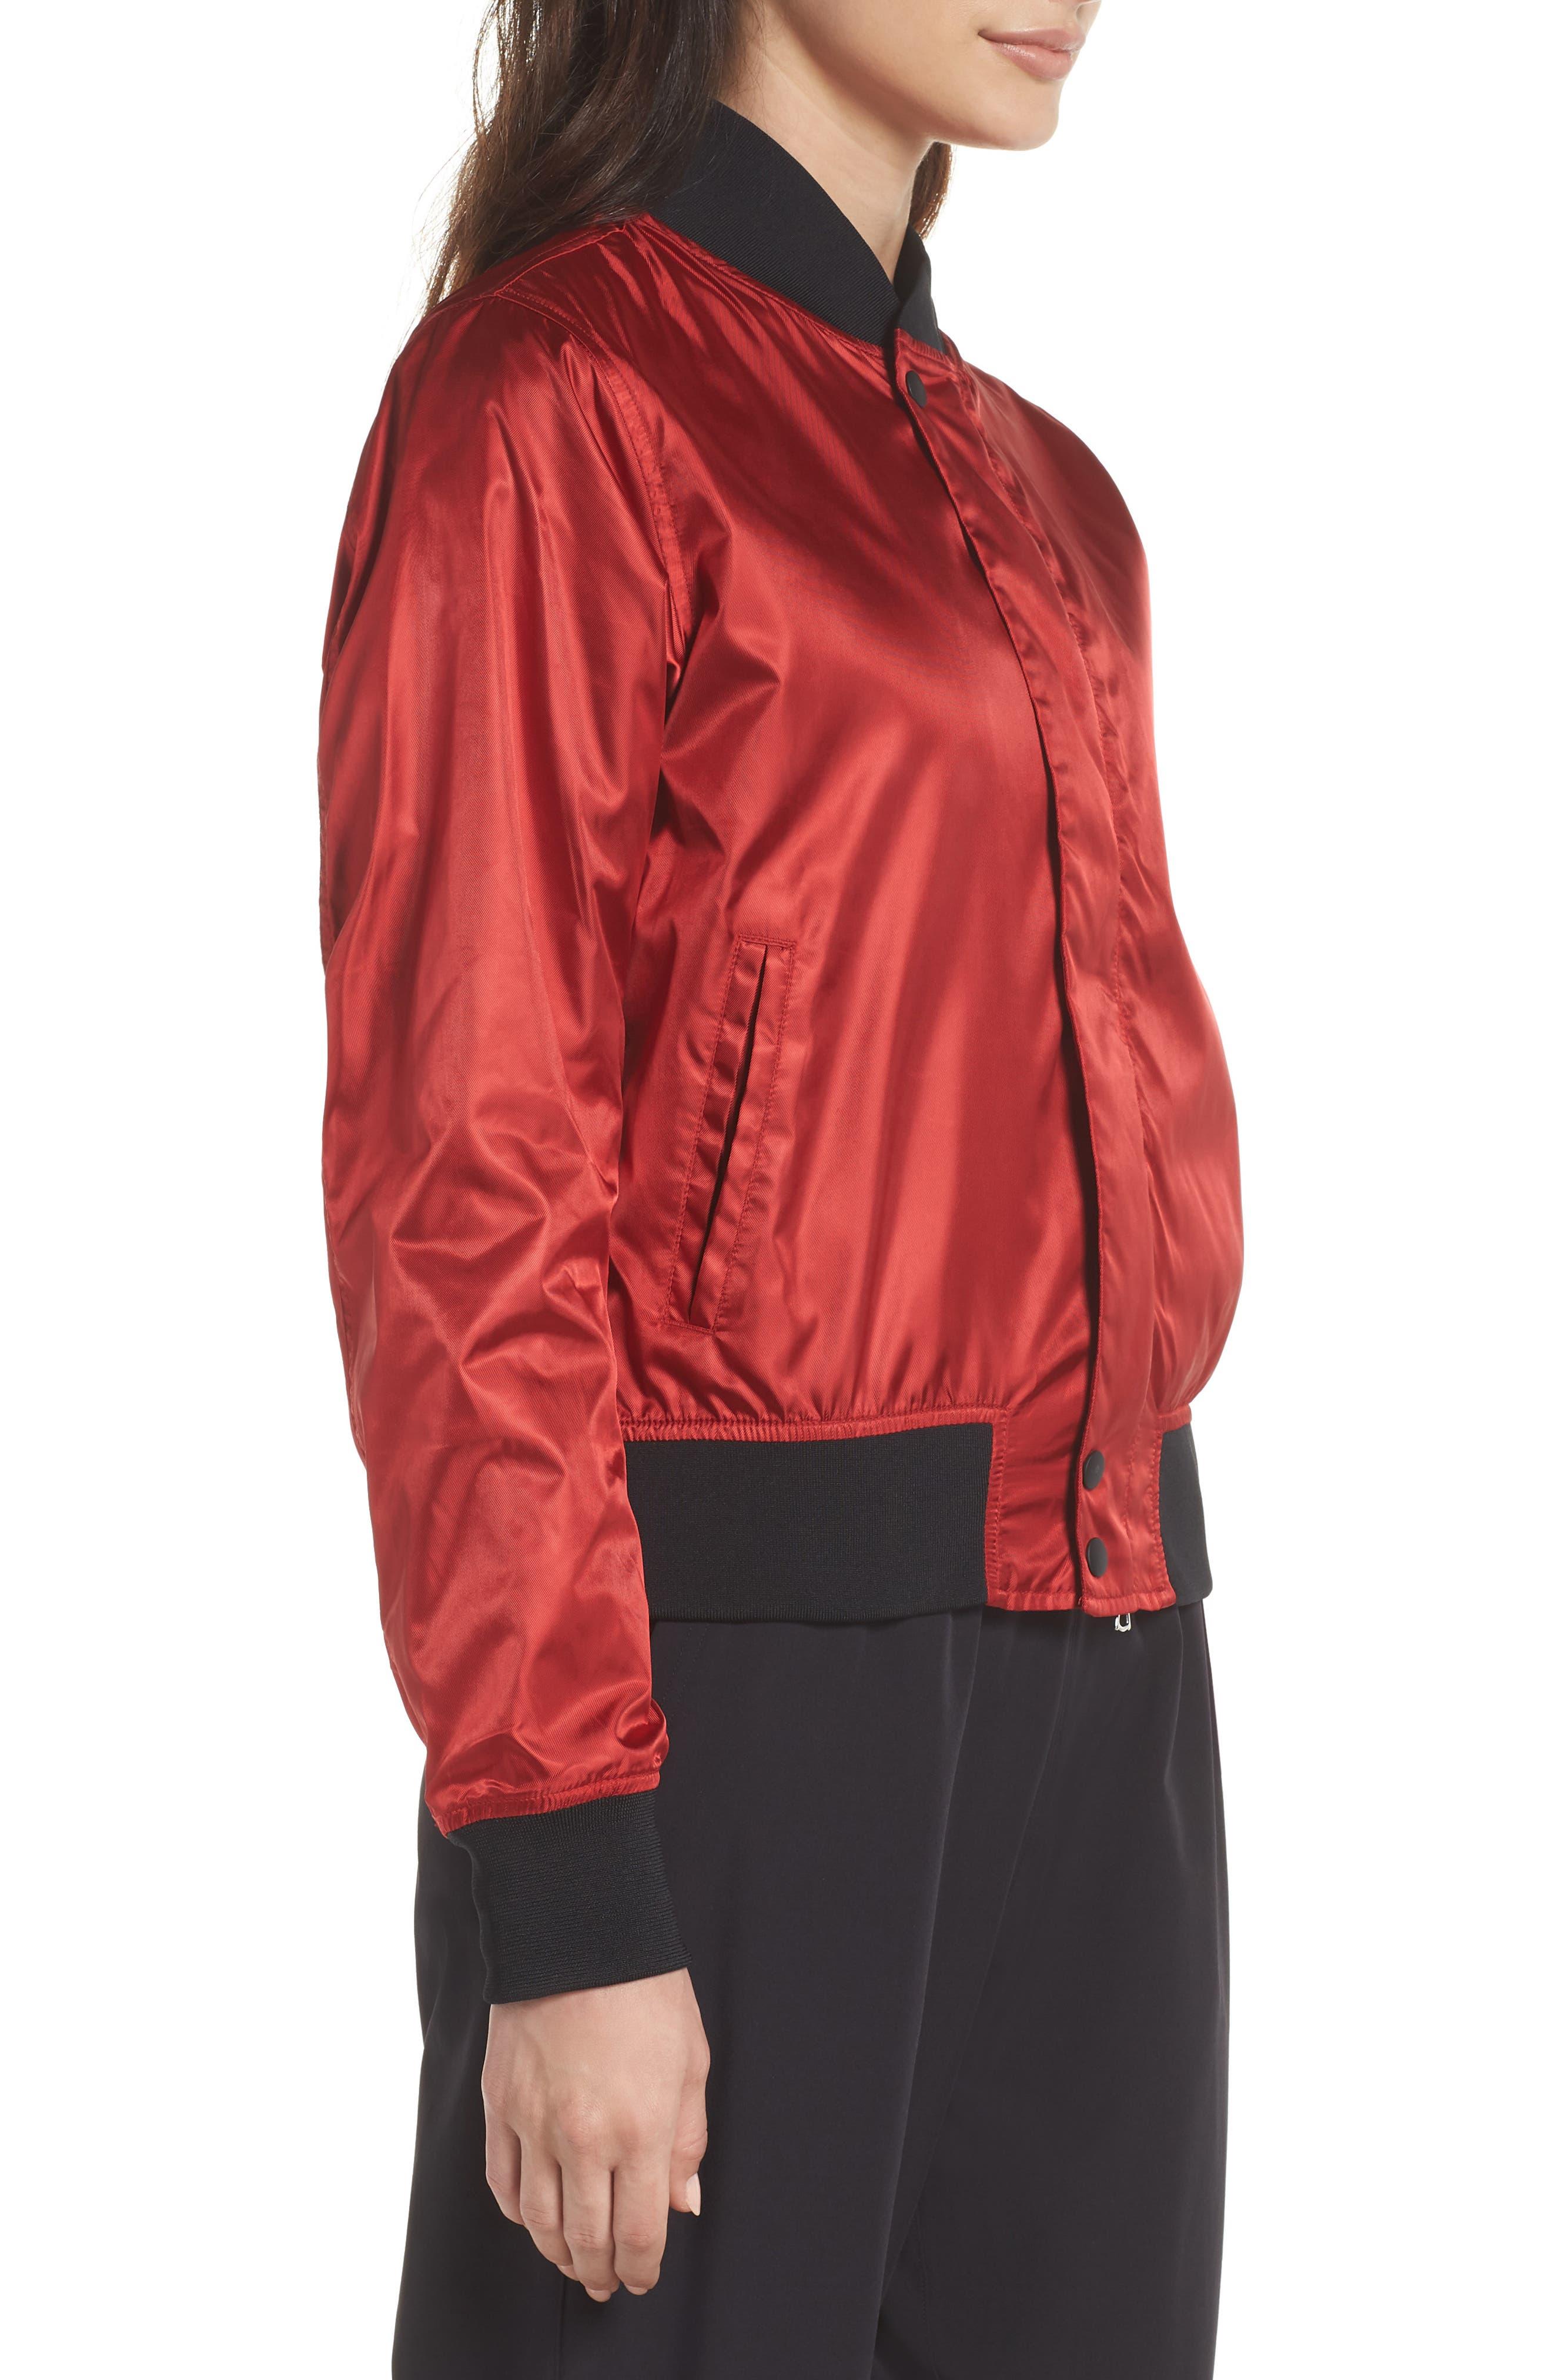 NikeLab Collection Women's Satin Bomber Jacket,                             Alternate thumbnail 3, color,                             Gym Red/ Black